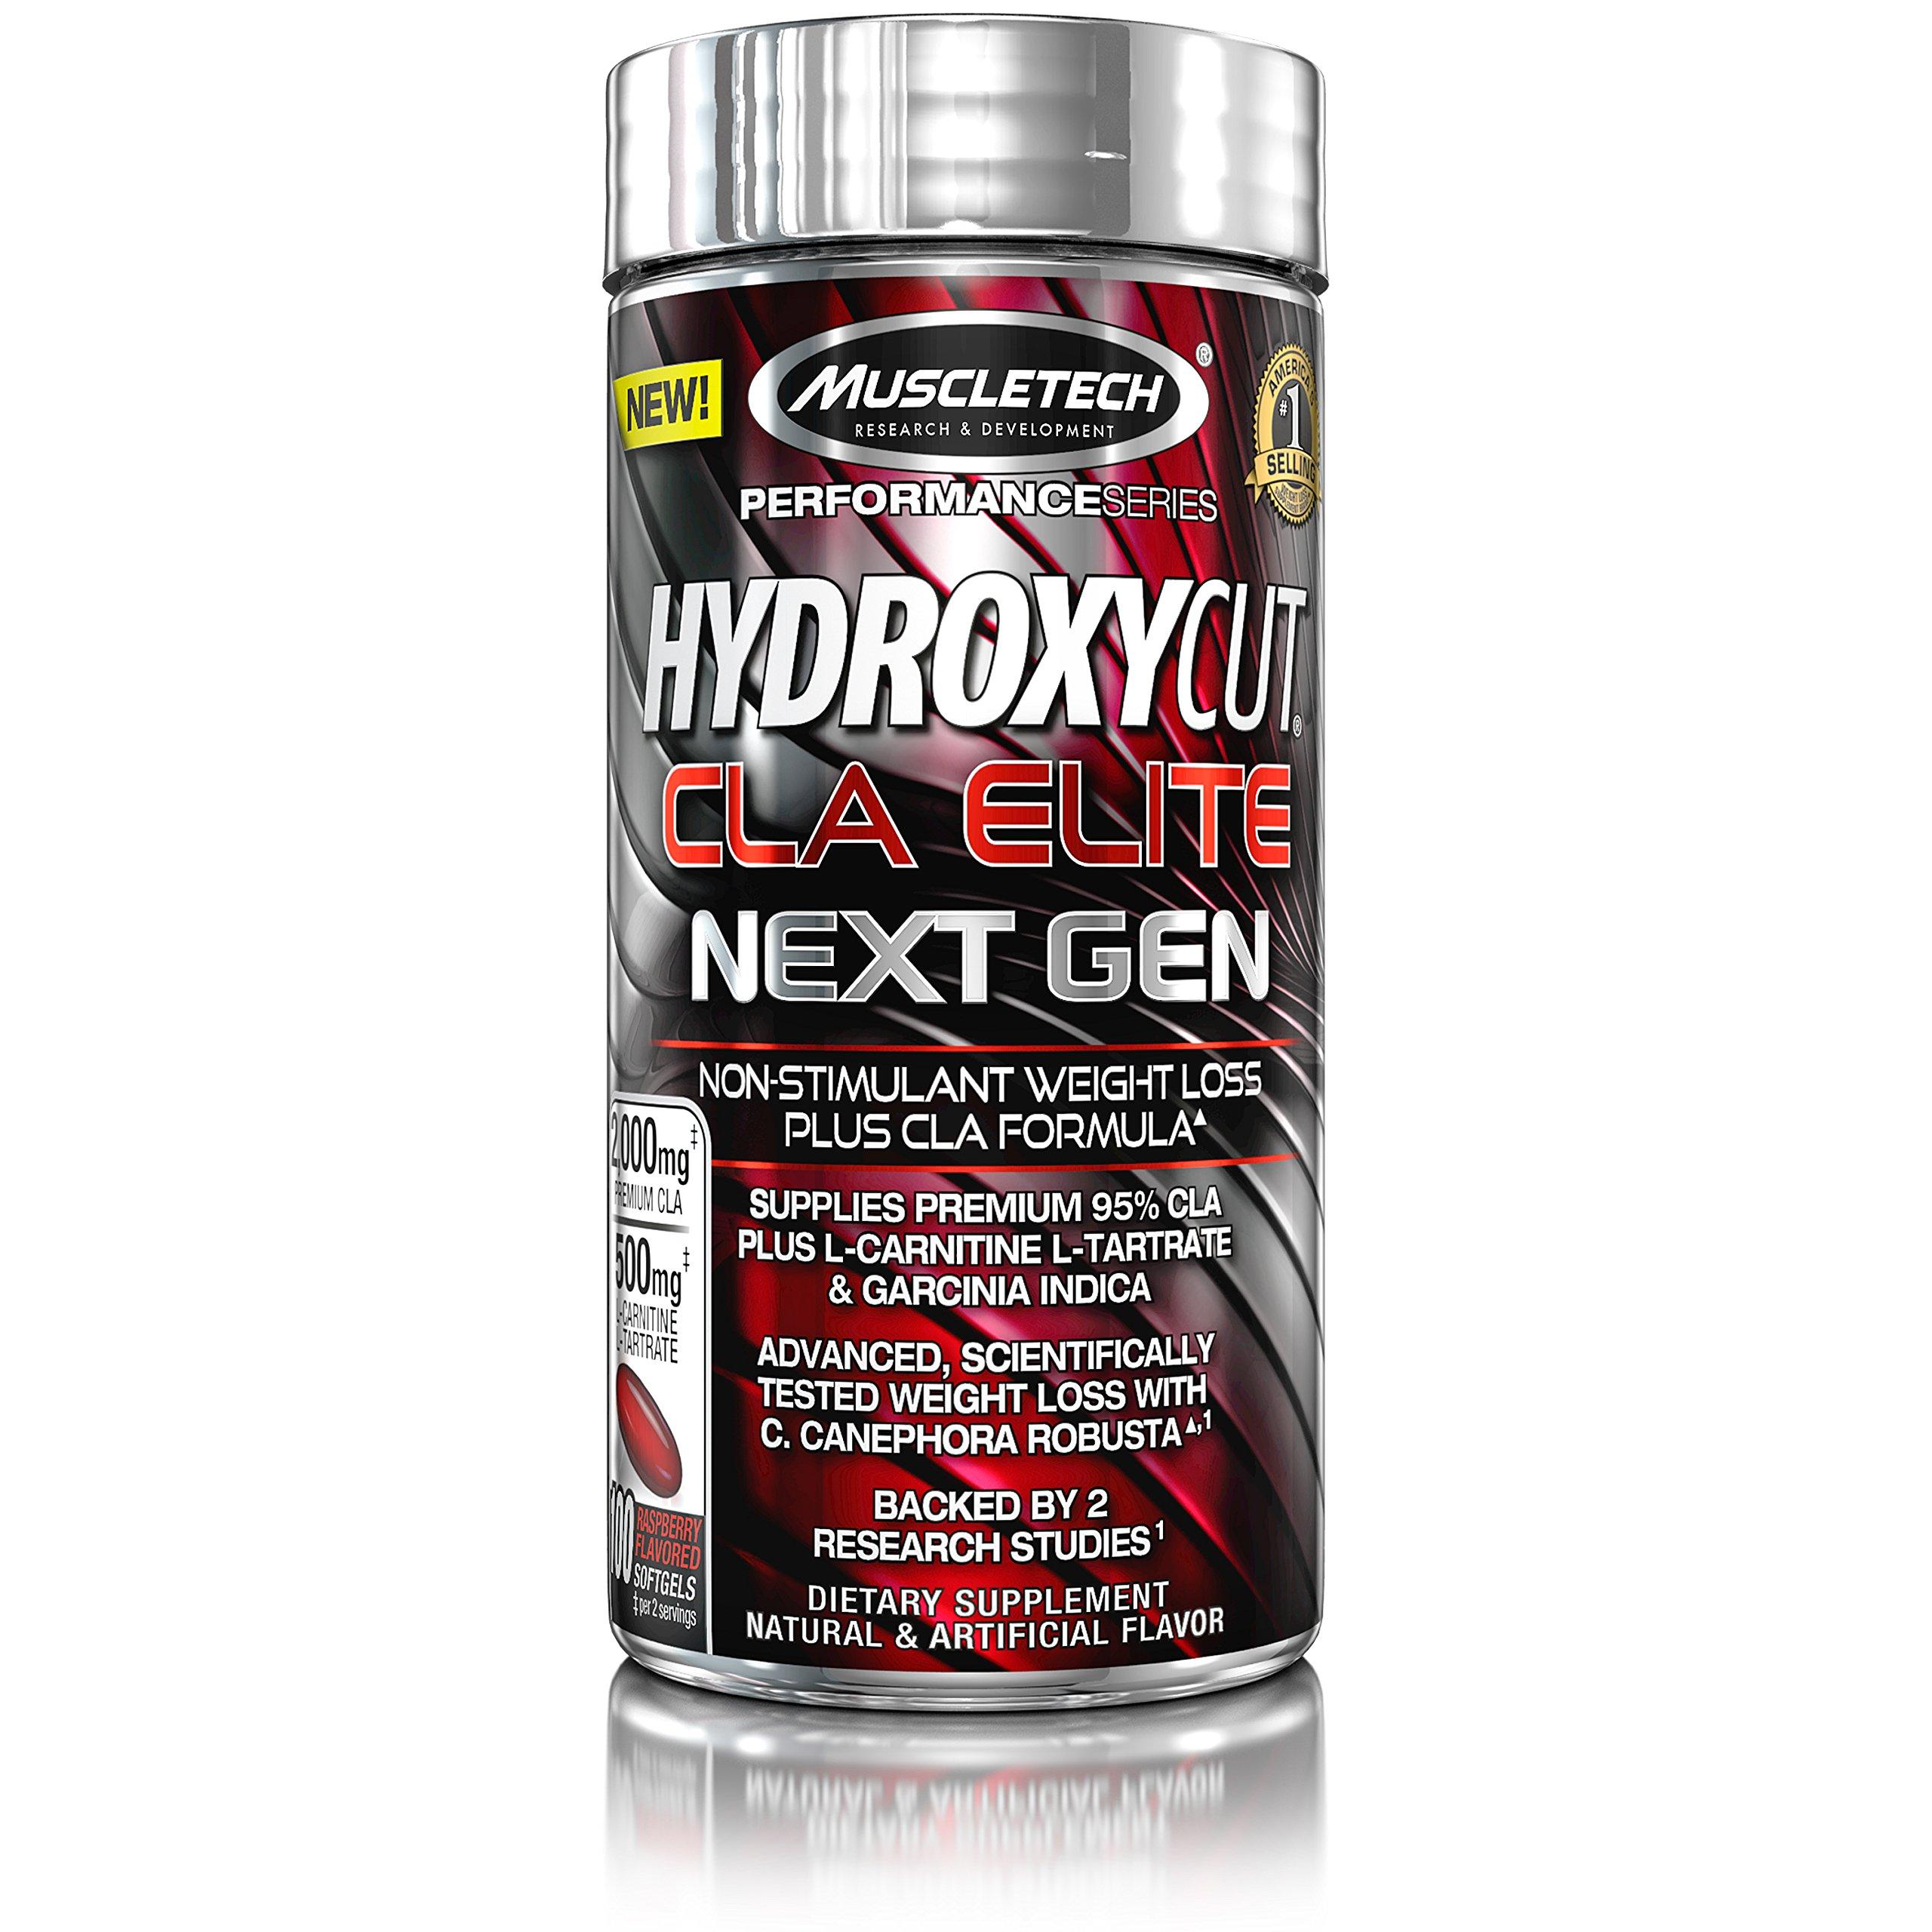 MuscleTech Hydroxycut CLA Elite Next Gen, Non Stimulant Weight Loss Plus CLA Formula, 100 Count